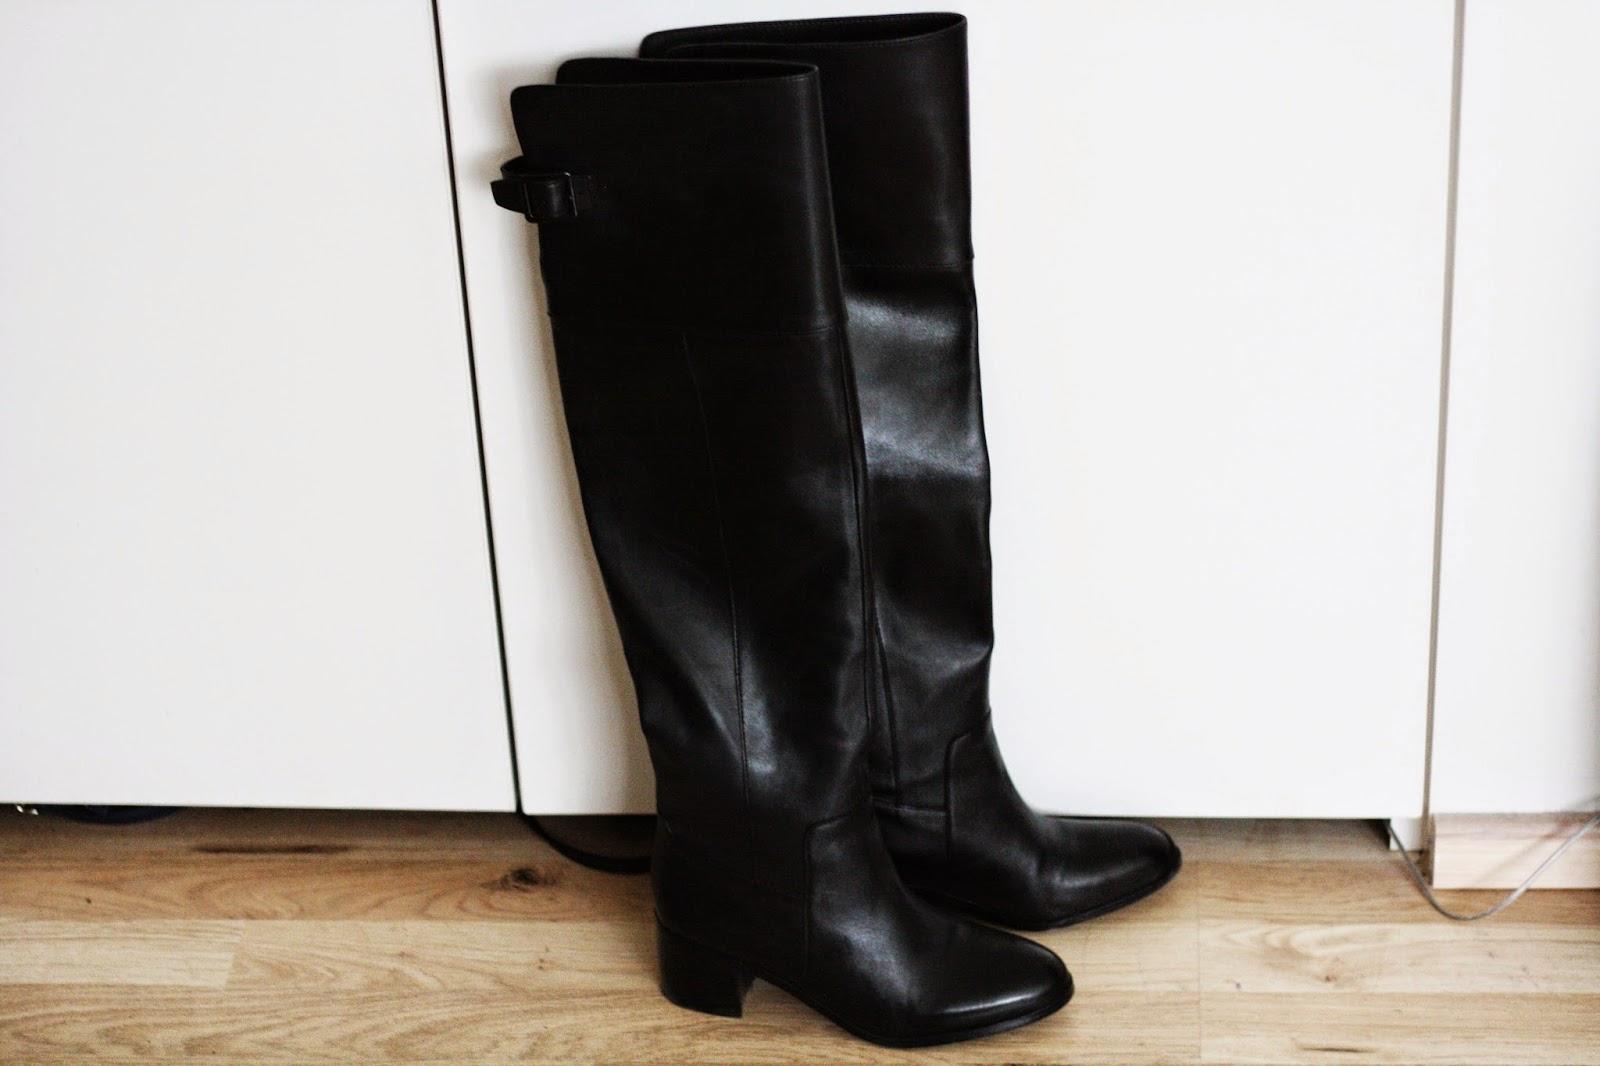 d32753a5732 Twirlybirdie  New boots from Aldo